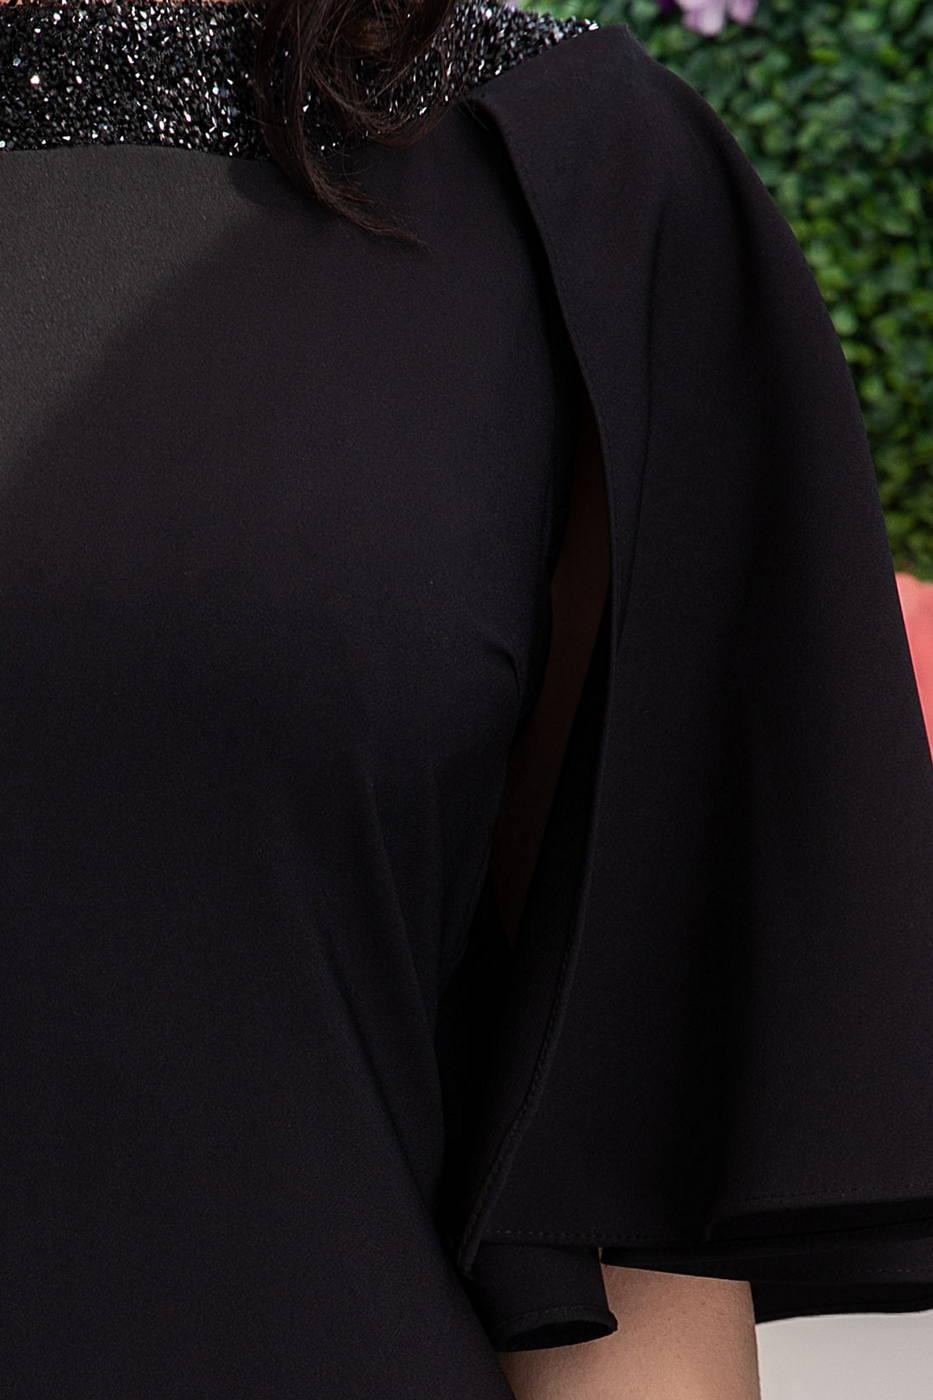 Hermione Μαύρο Φόρεμα 1102